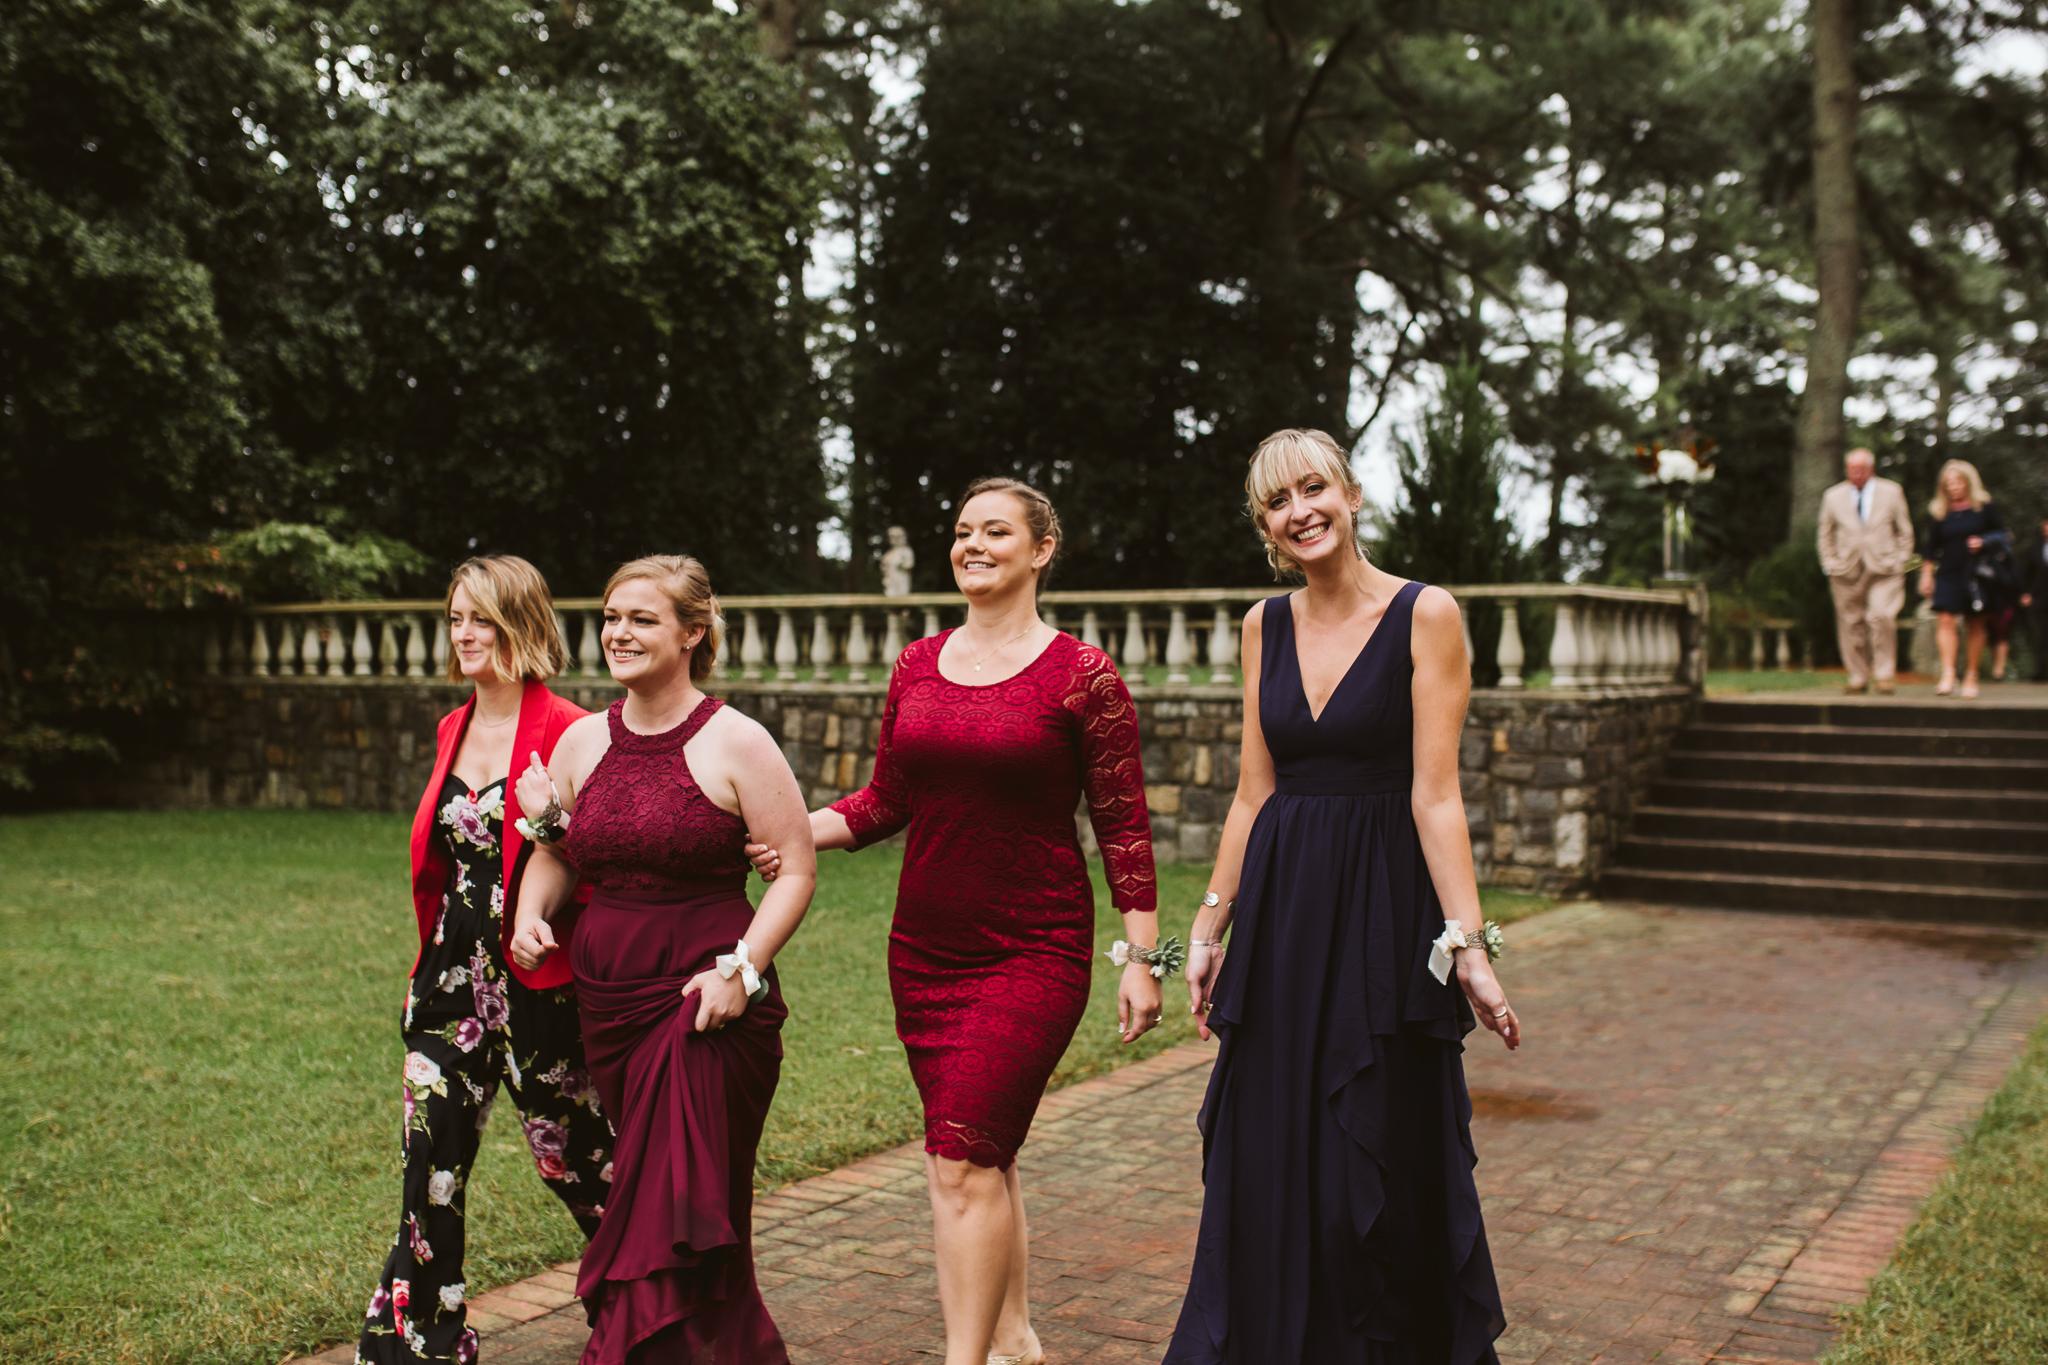 hamptonroads_wedding_norfolk_botanical_gardens-36.JPG